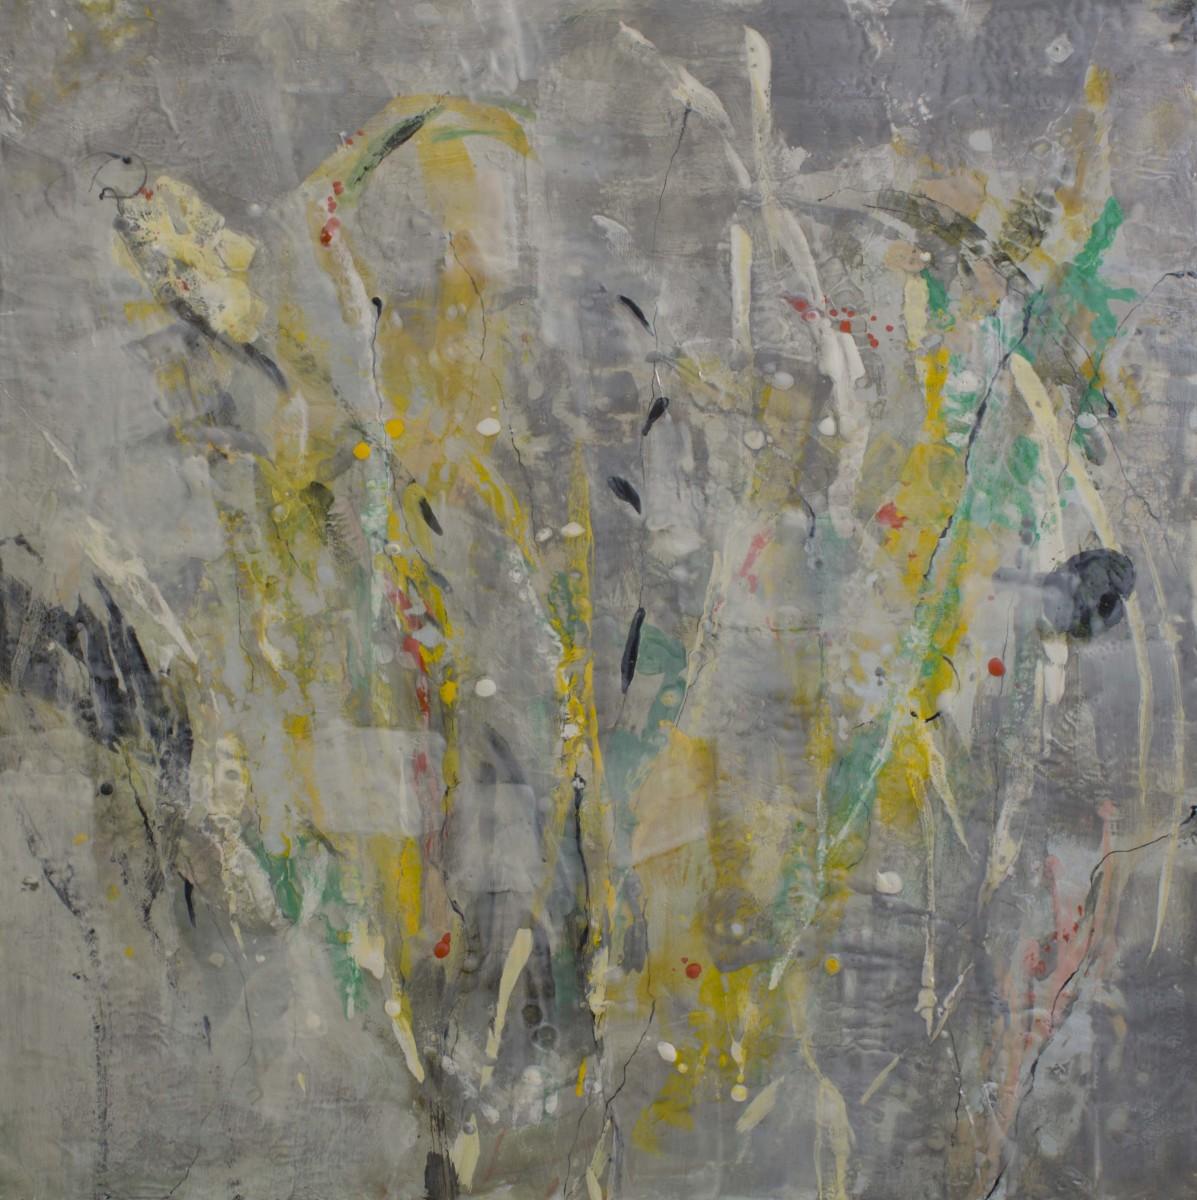 Chasing Fireflies by Helen DeRamus